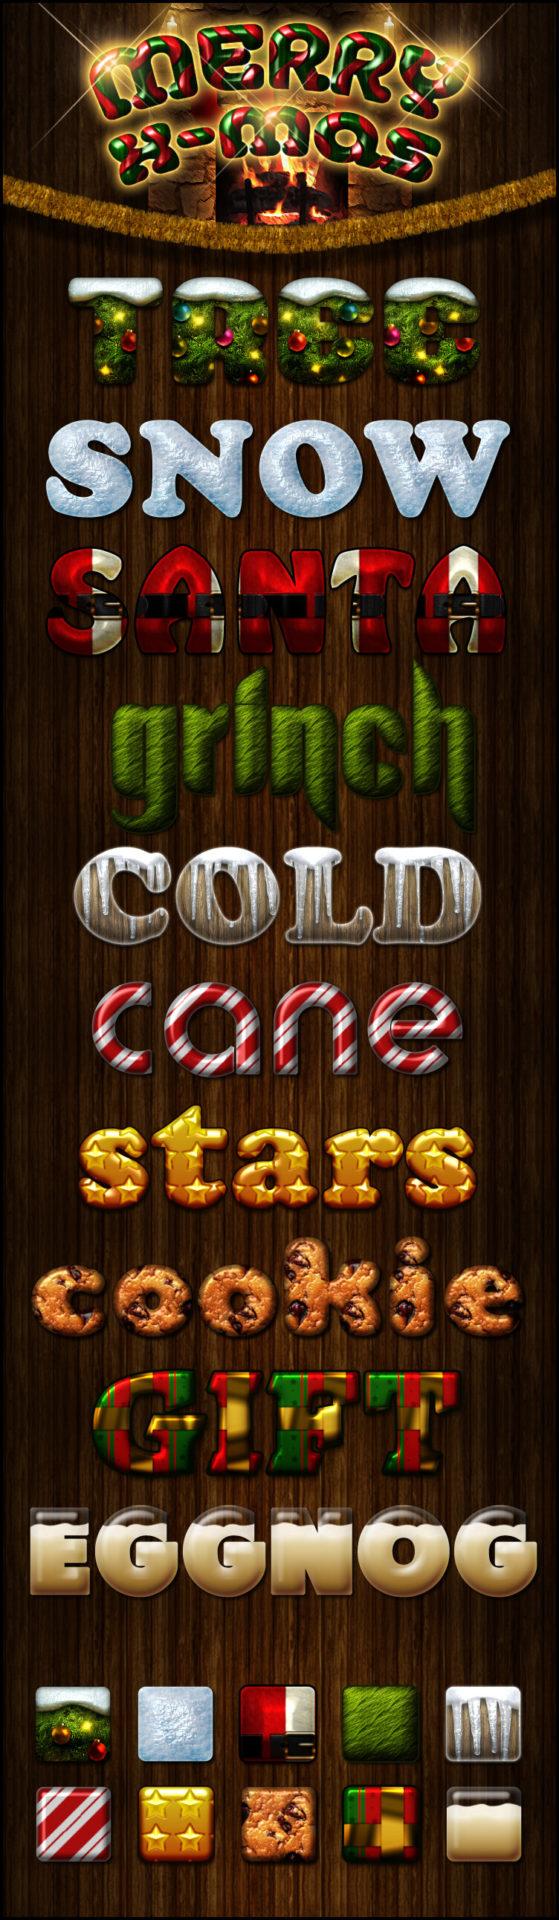 Photoshop Christmas Text Effect Xmas フォトショップ クリスマス テキストエフェクト merry x-mas styles